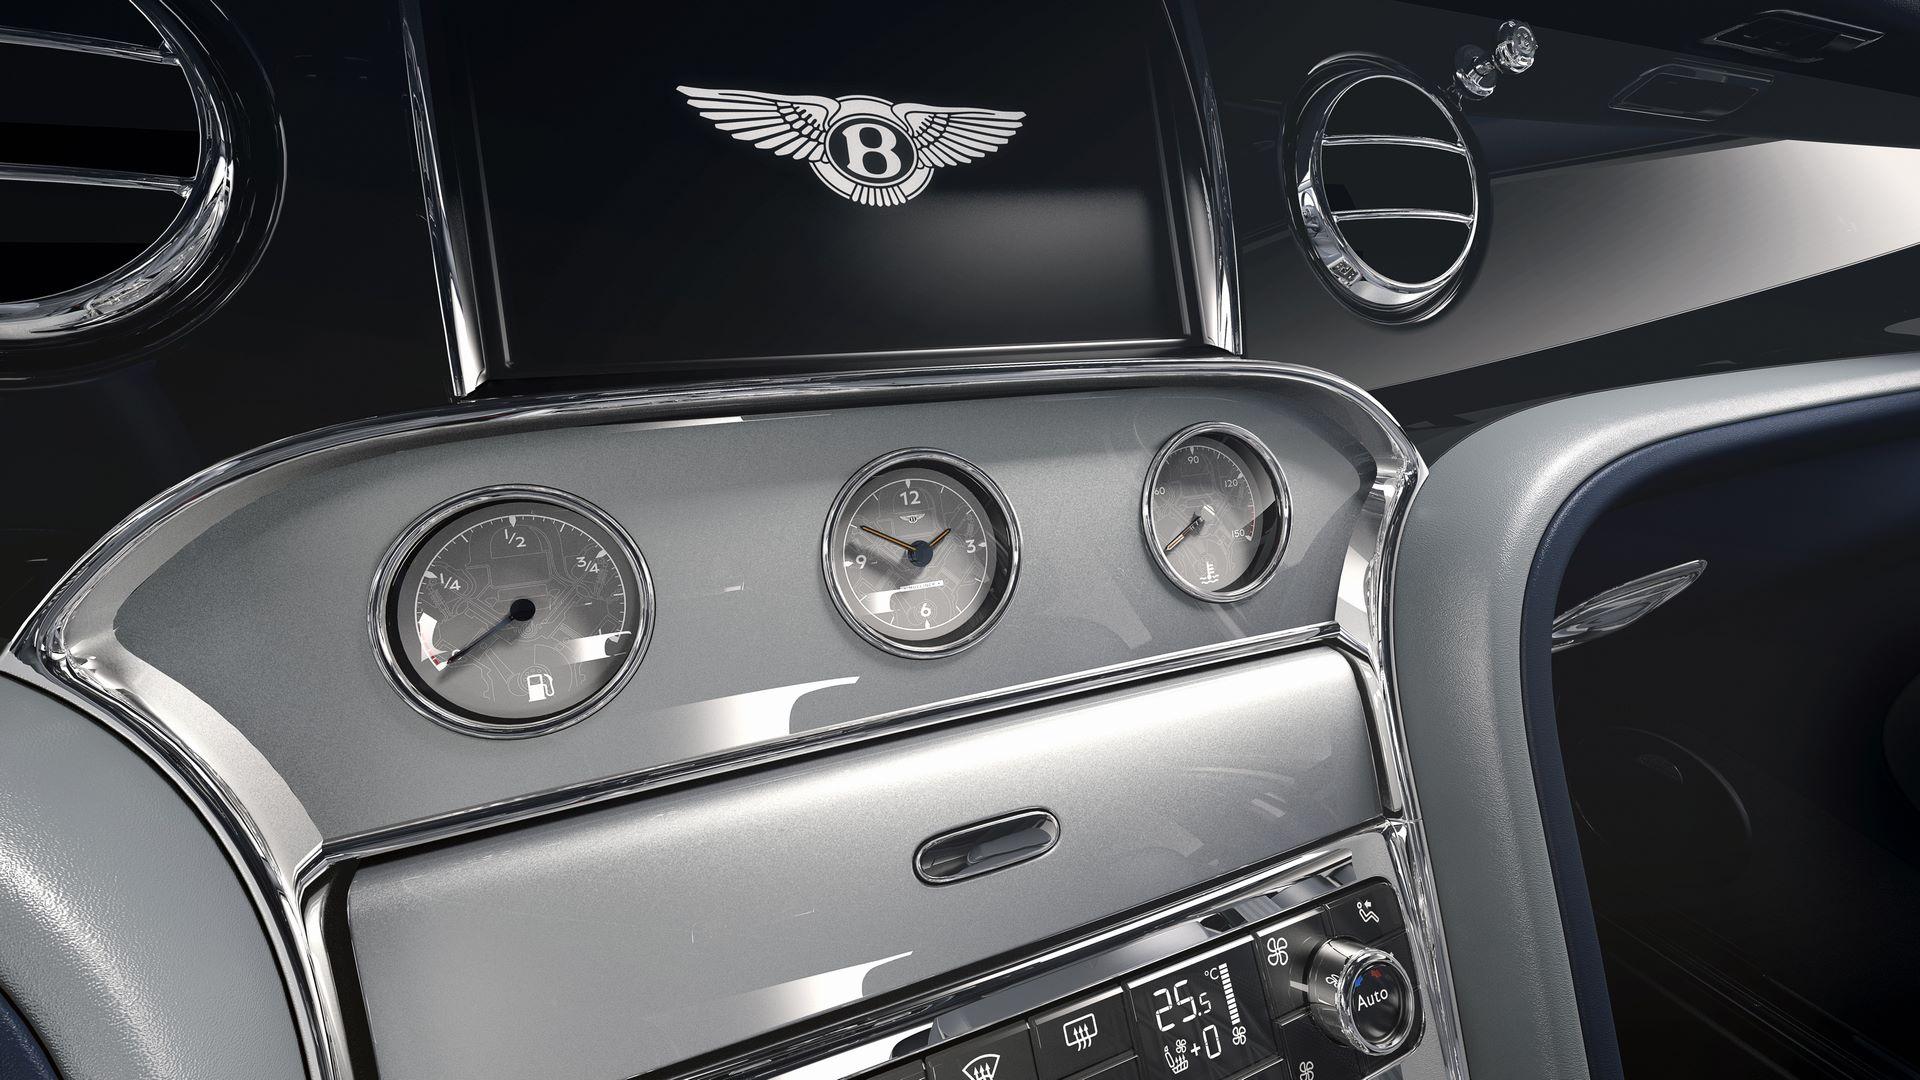 Bentley-Mulsanne-6.75-Edition-By-Mulliner-10